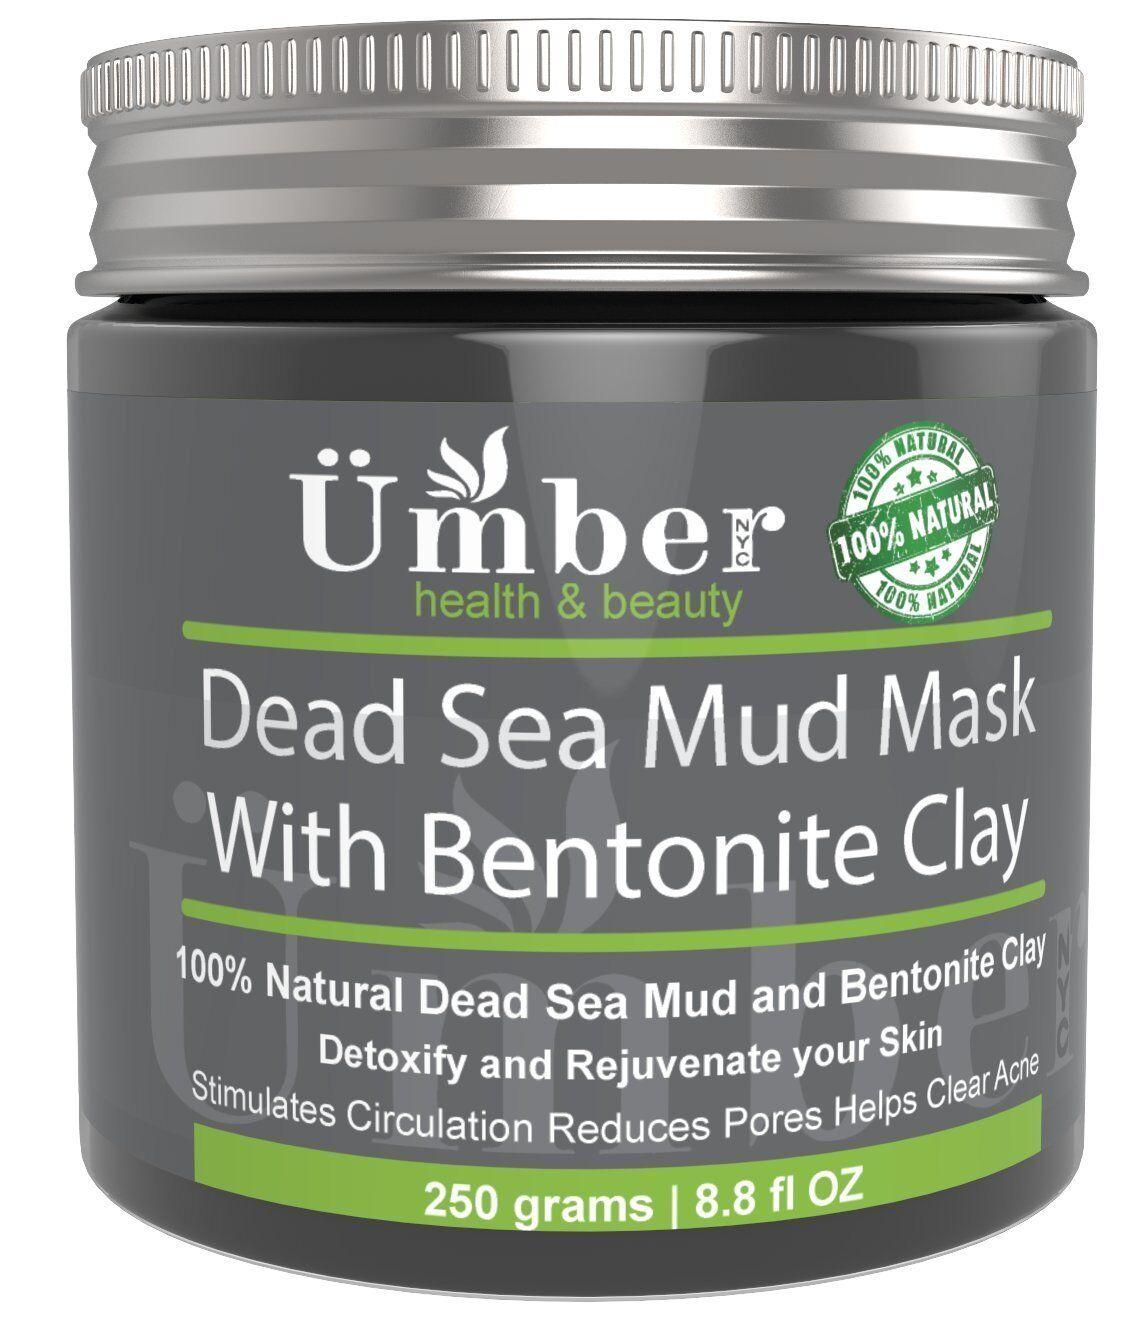 Dead Sea Mud Mask with Bentonite Clay - Mineral Rich Formula